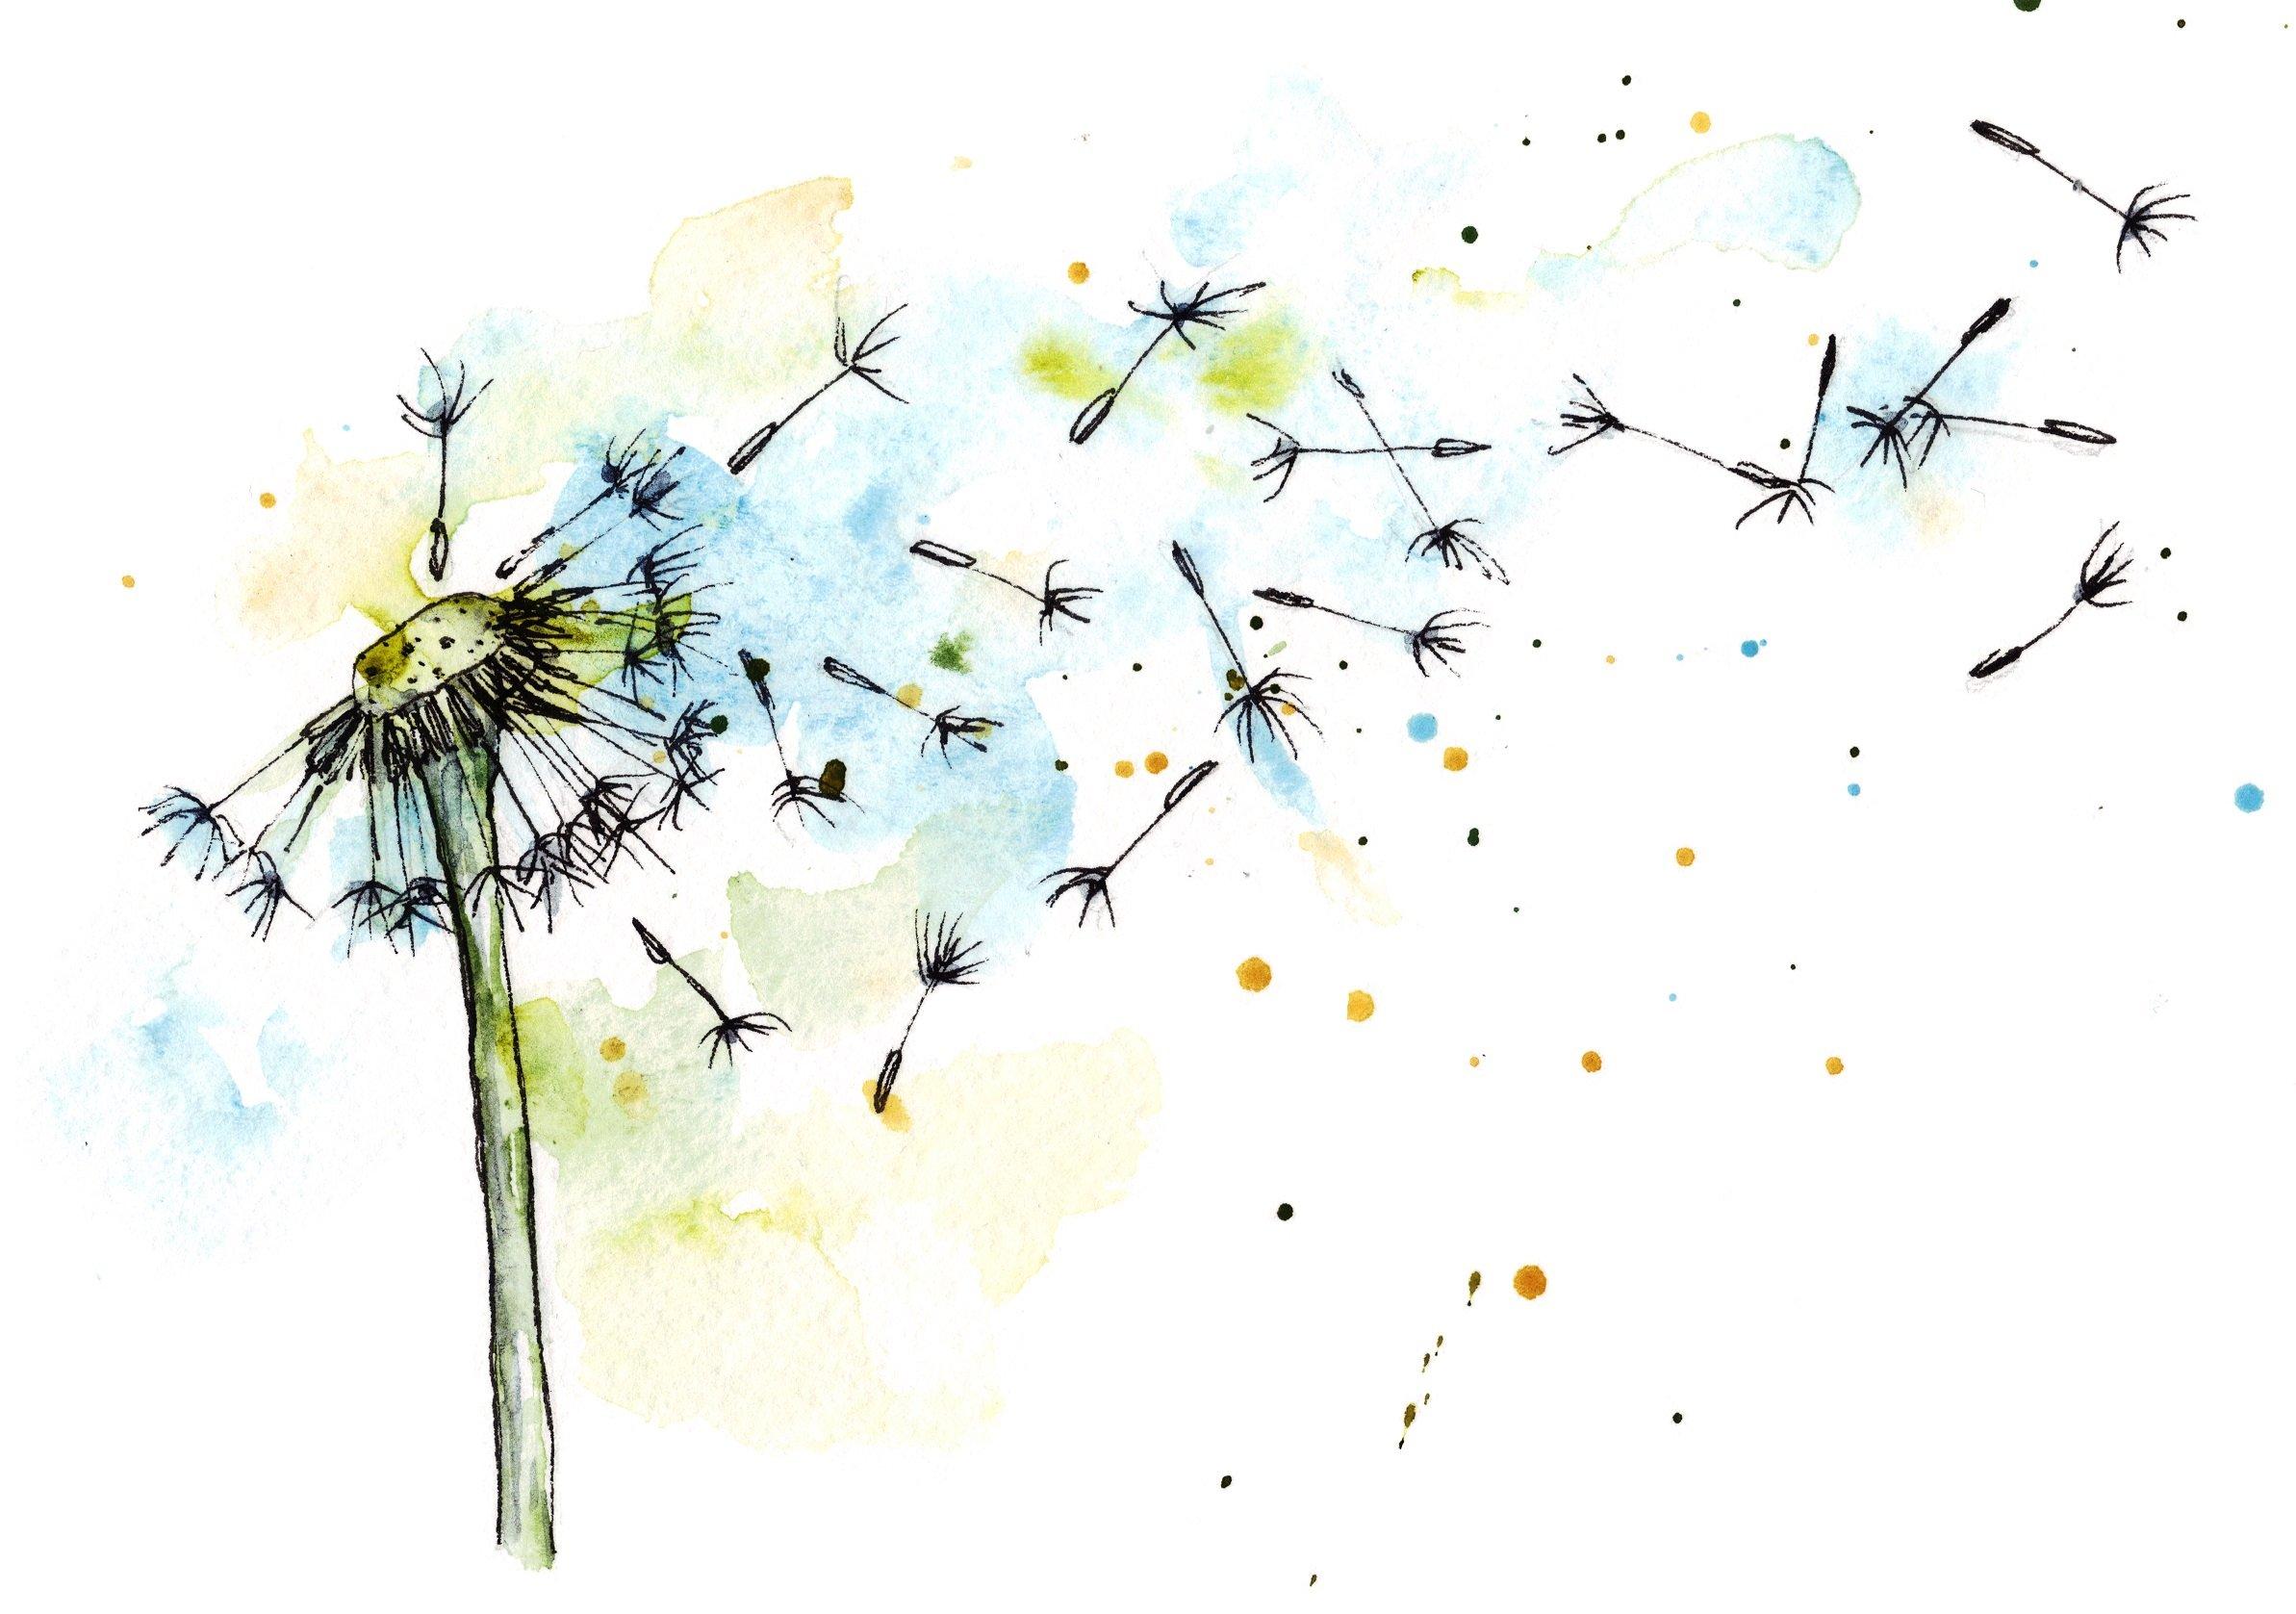 dandelion in watercolor and ink illustrations creative market. Black Bedroom Furniture Sets. Home Design Ideas